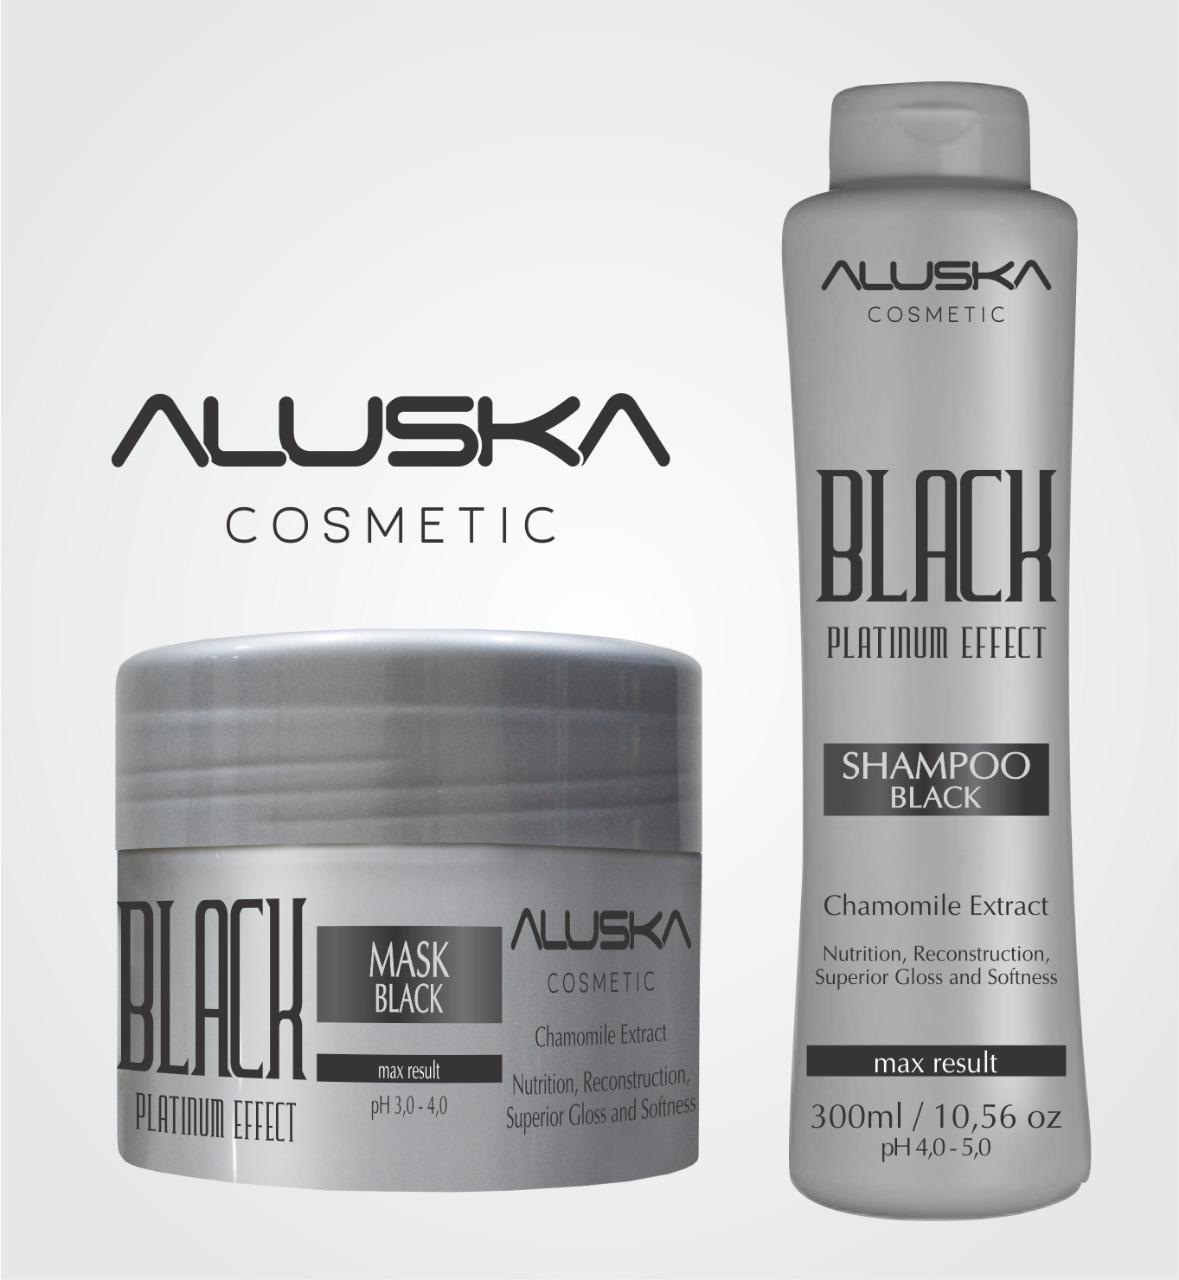 ALUSKA COSMETIC - Black Platinum Effect